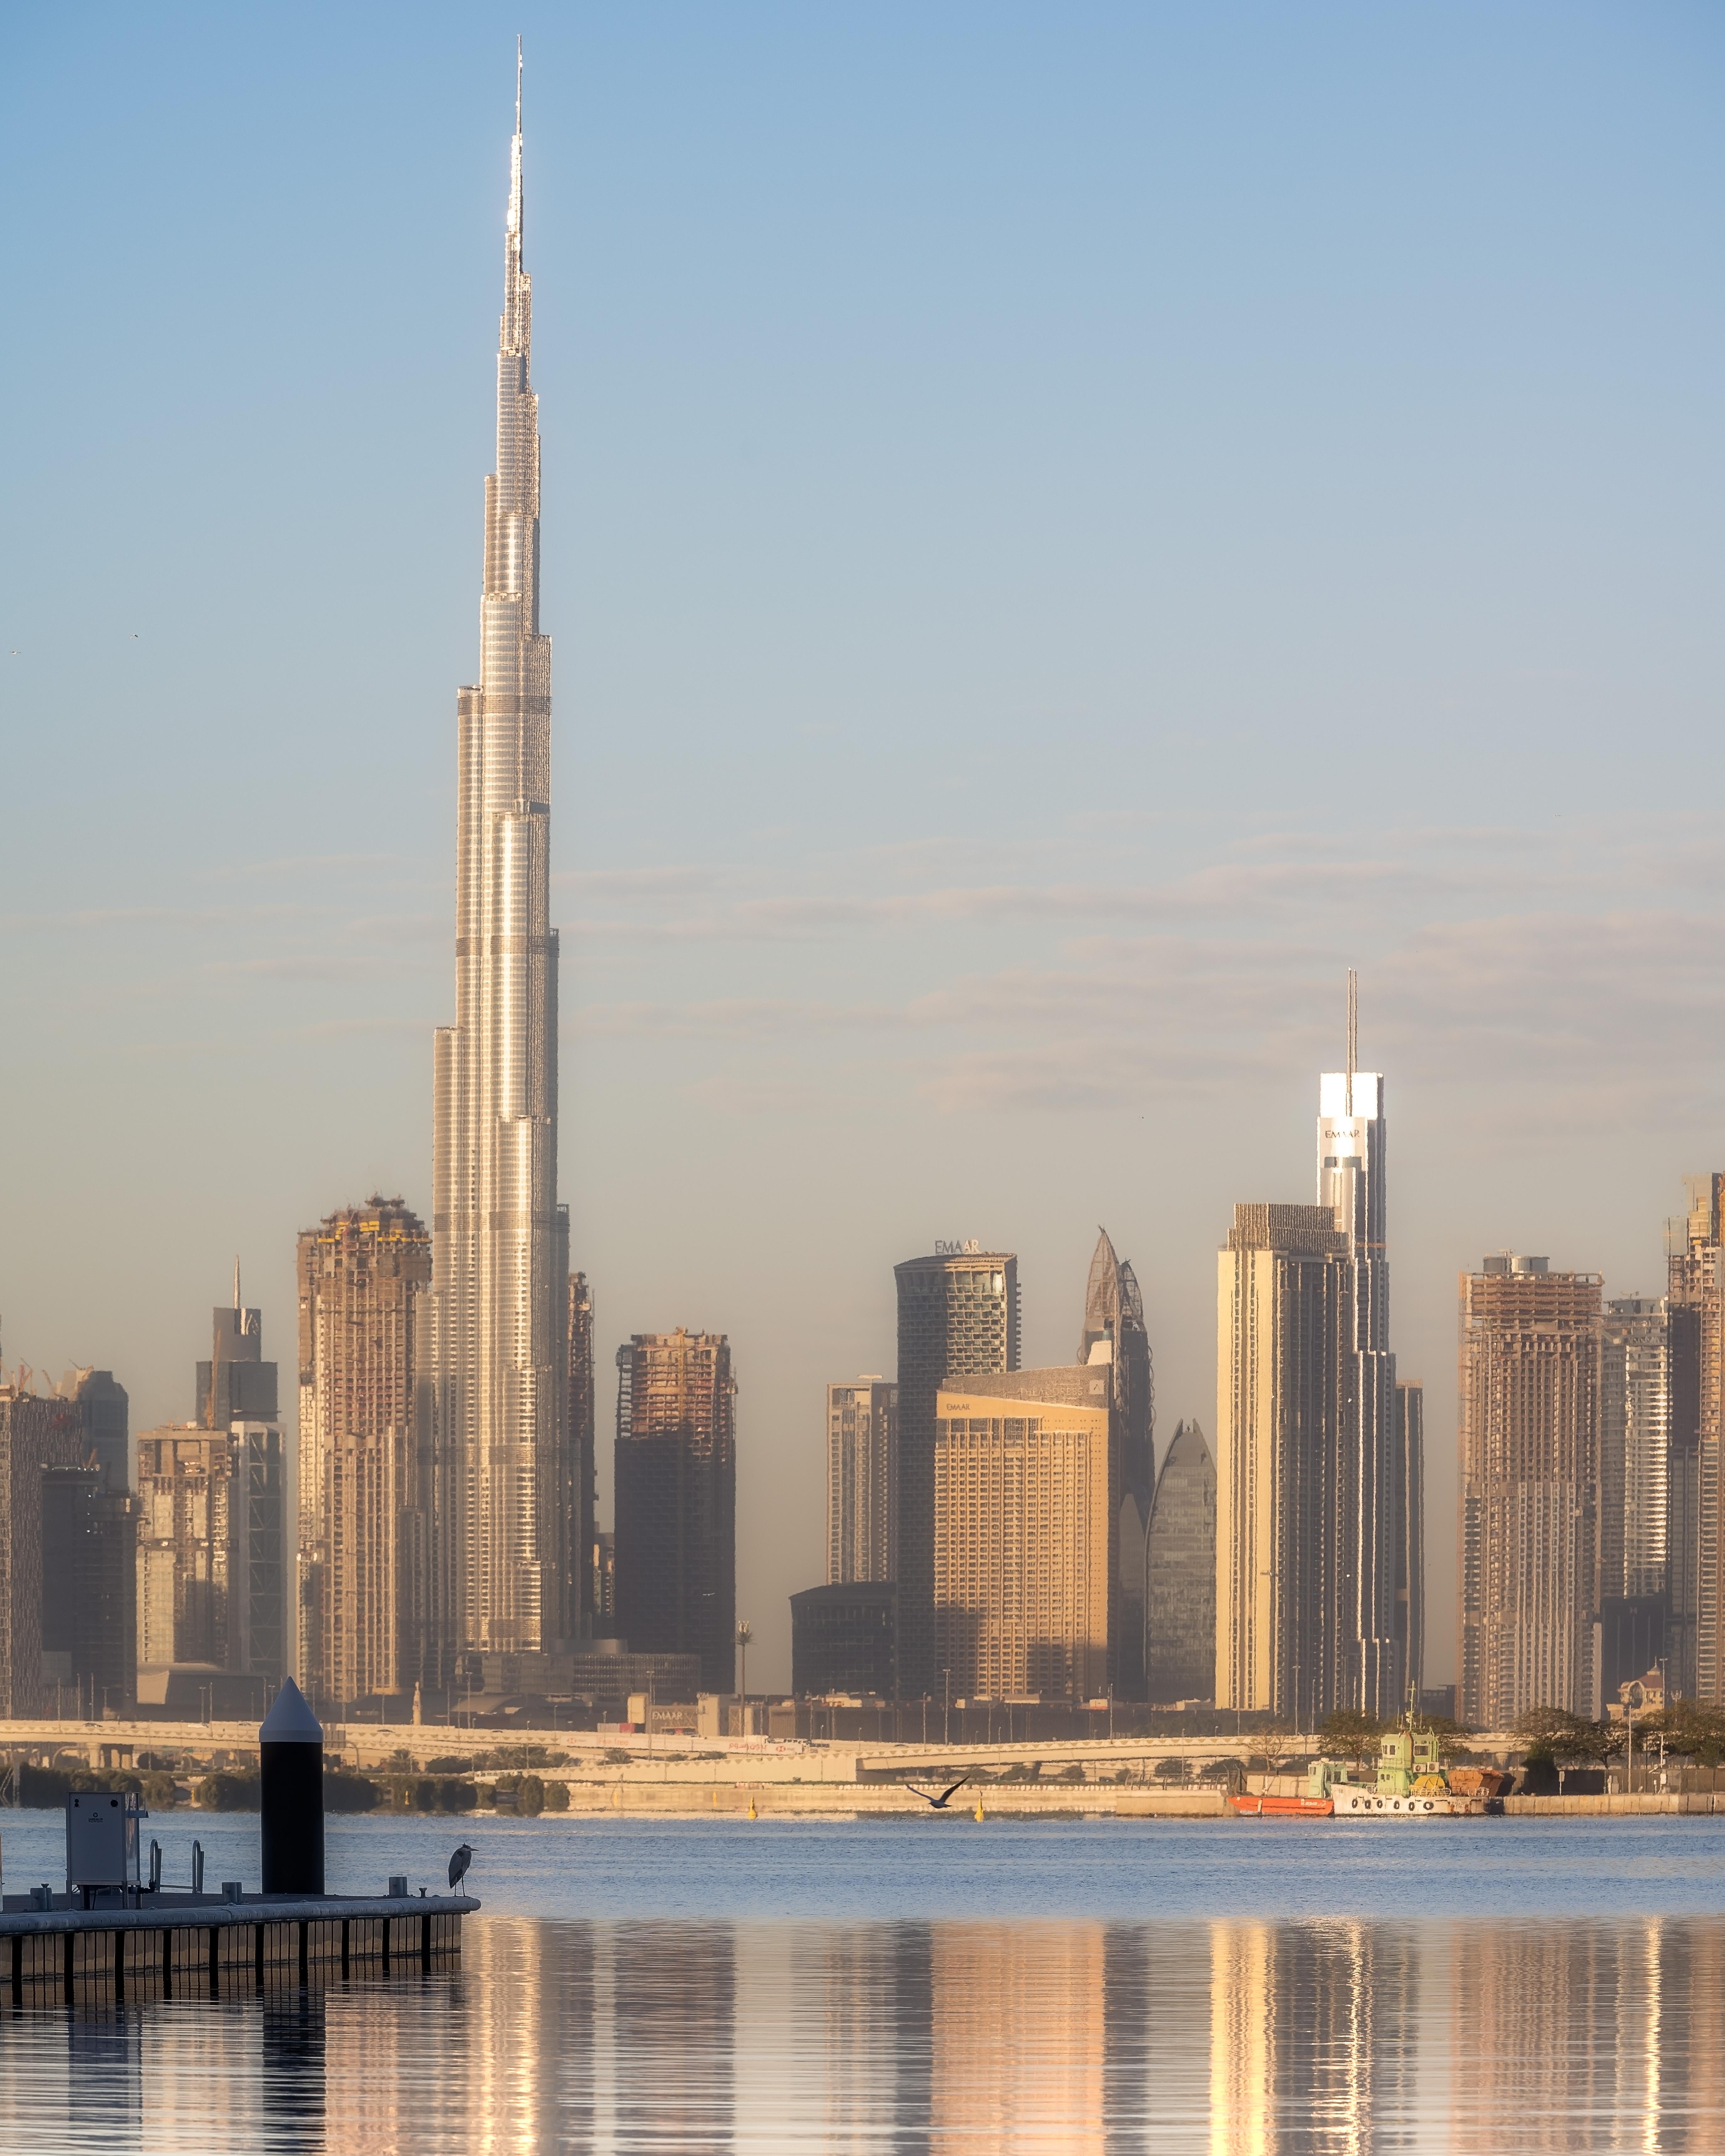 A still sunrise from Dubai Creek Harbour